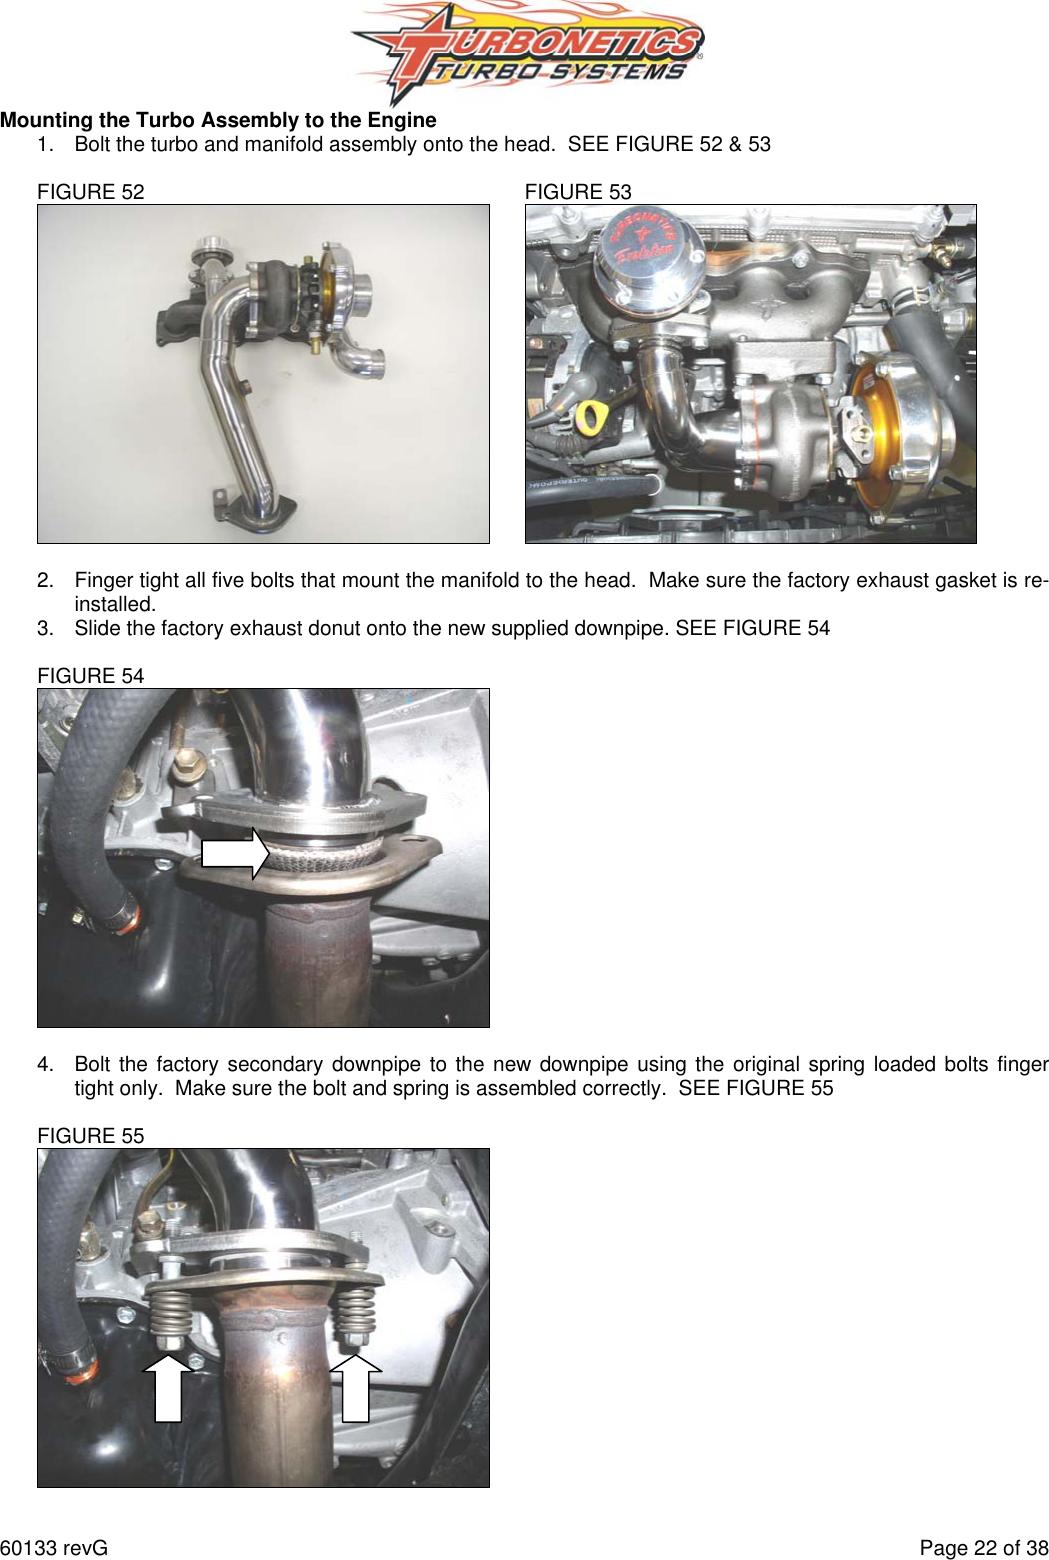 Turbonetics P N 15152 Users Manual 60133_revG